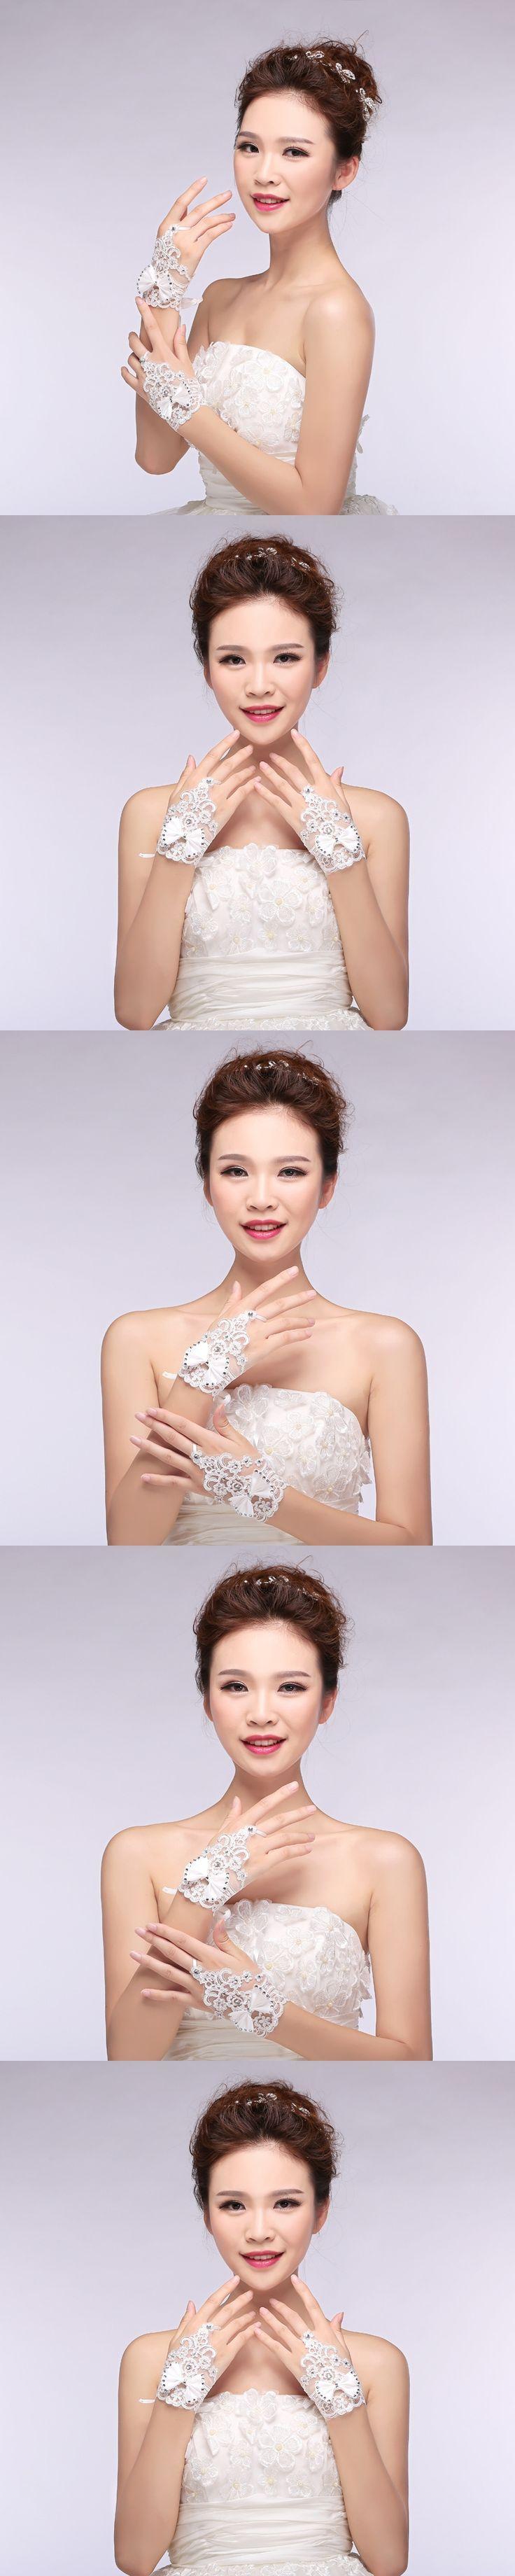 Fredd Shipping new Korean bride wedding gloves bridal lace chiffon short paragraph Spring Wedding Gloves white accessories H02N